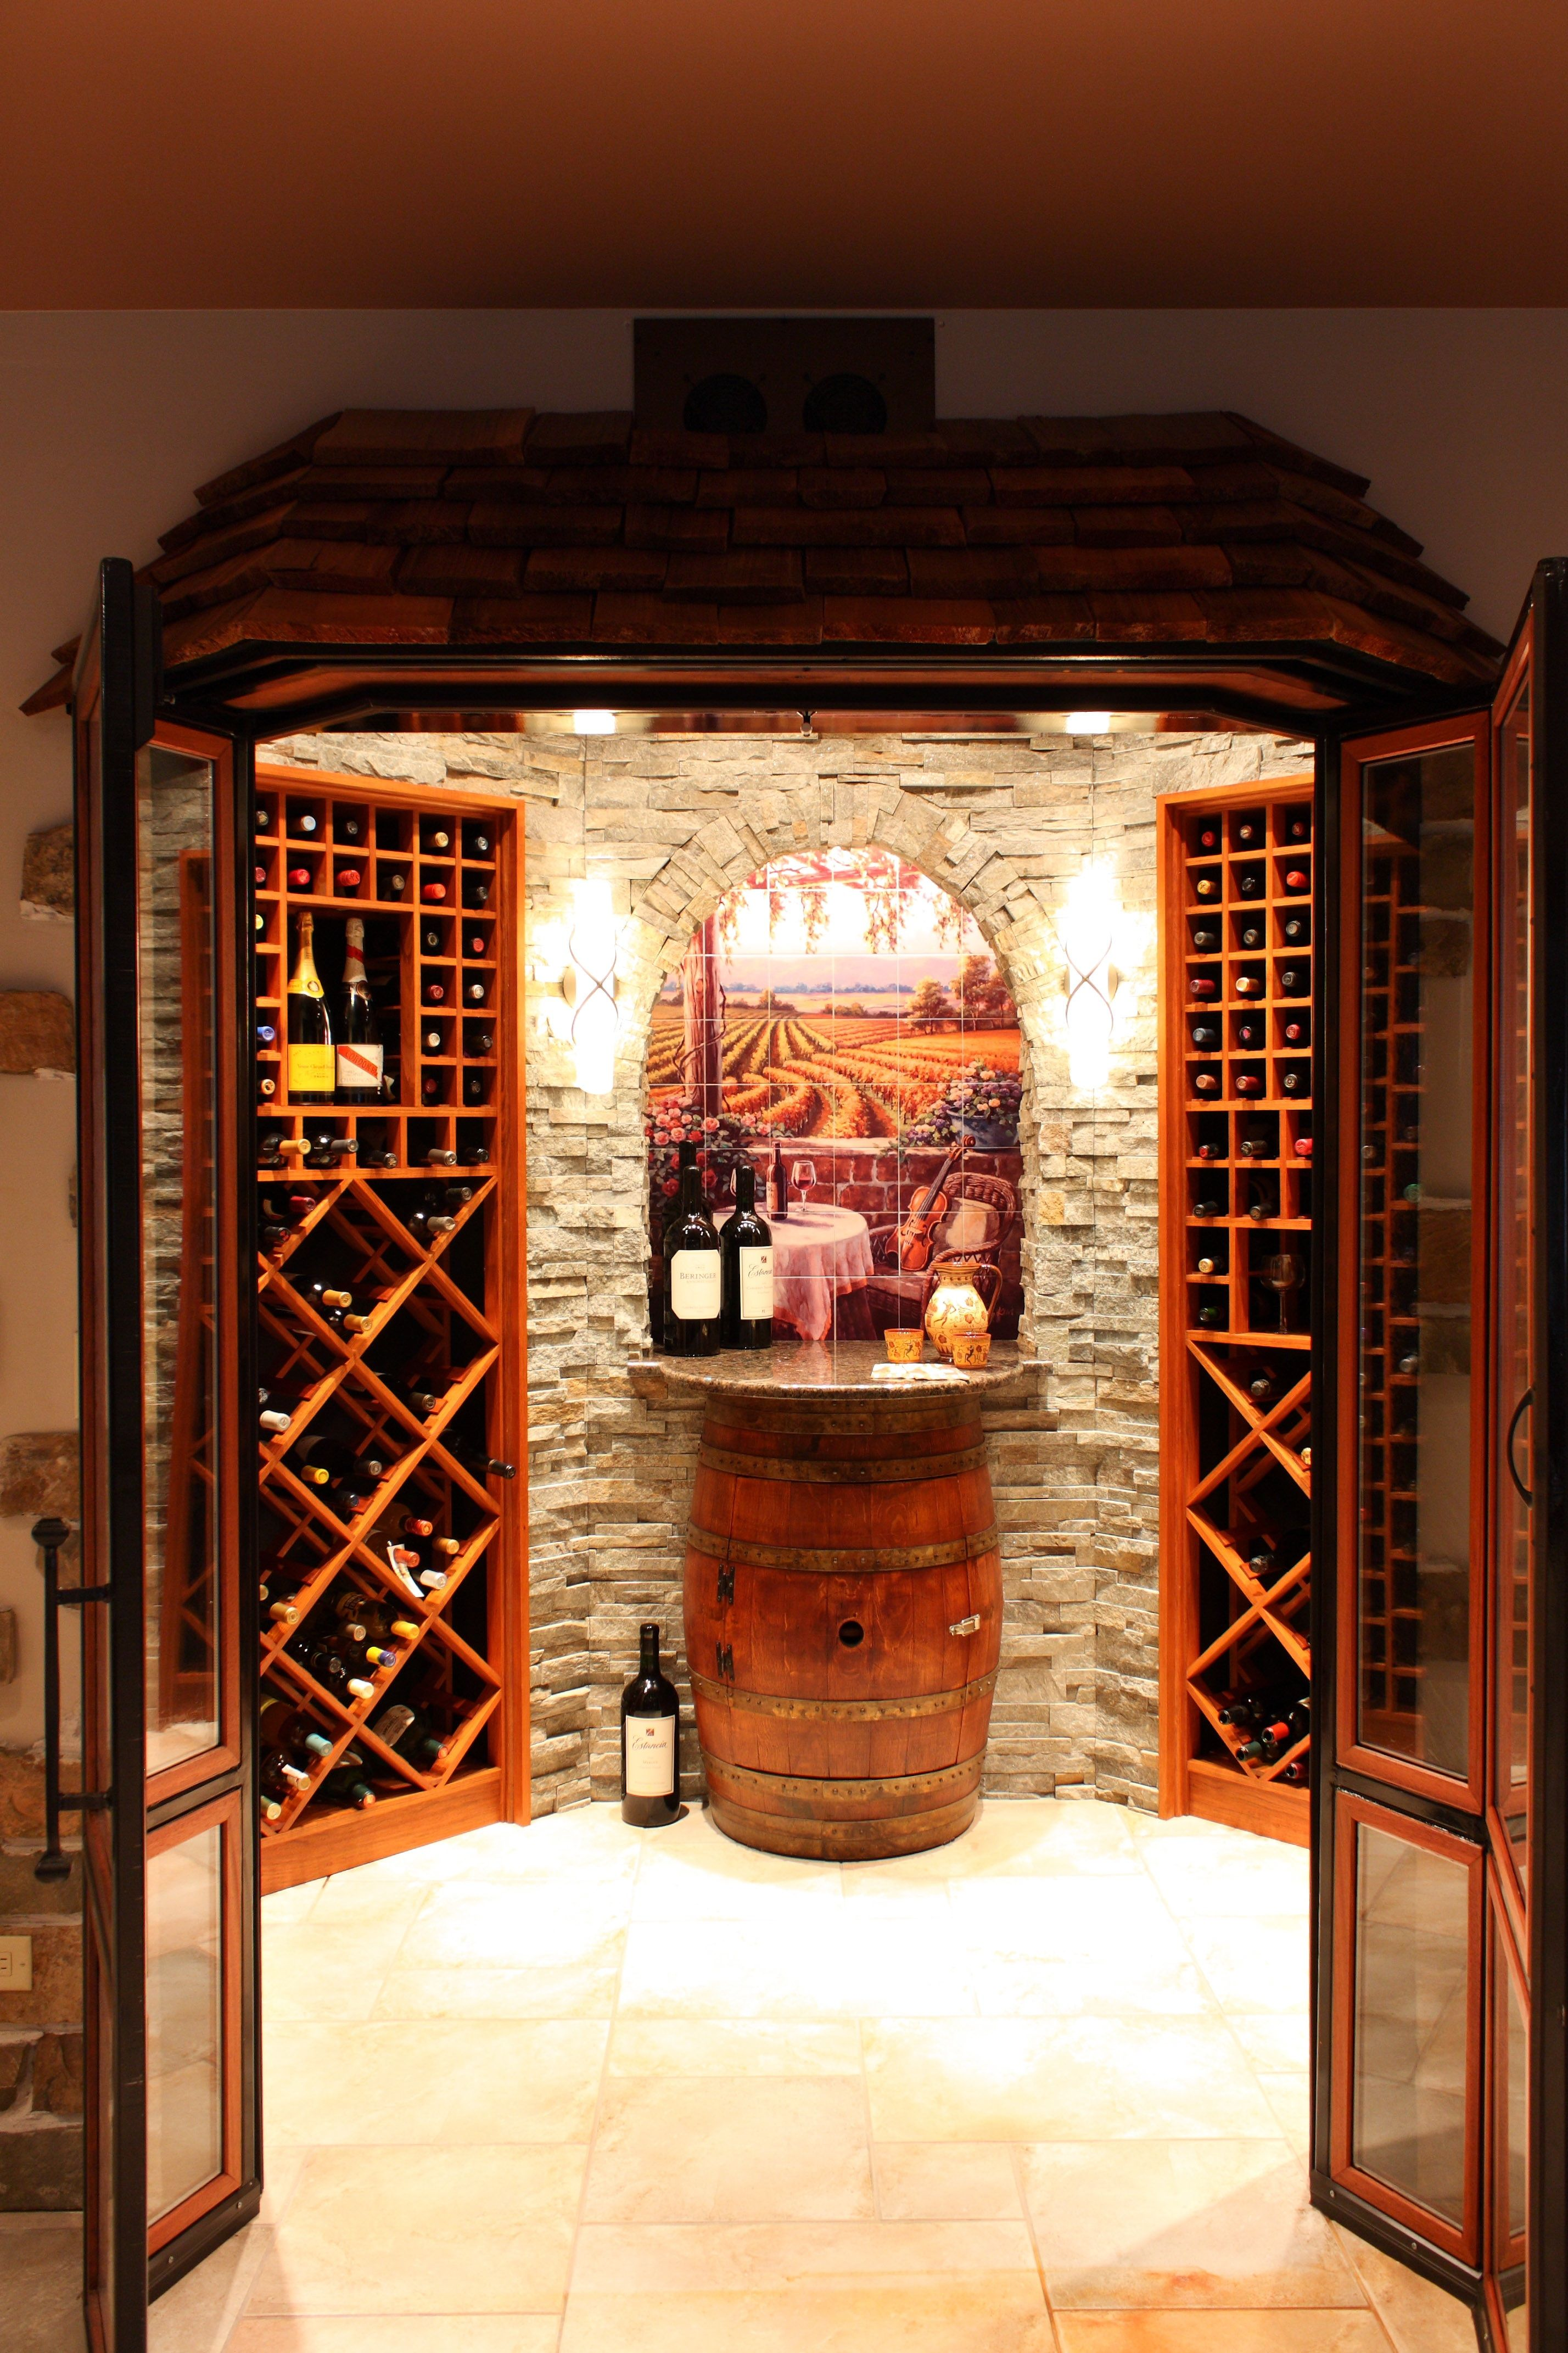 Wine Cellars in Bedford/ Bedford Real Estate/ Katonah Homes/ Mt Kisco Homes for sale/ Katonah